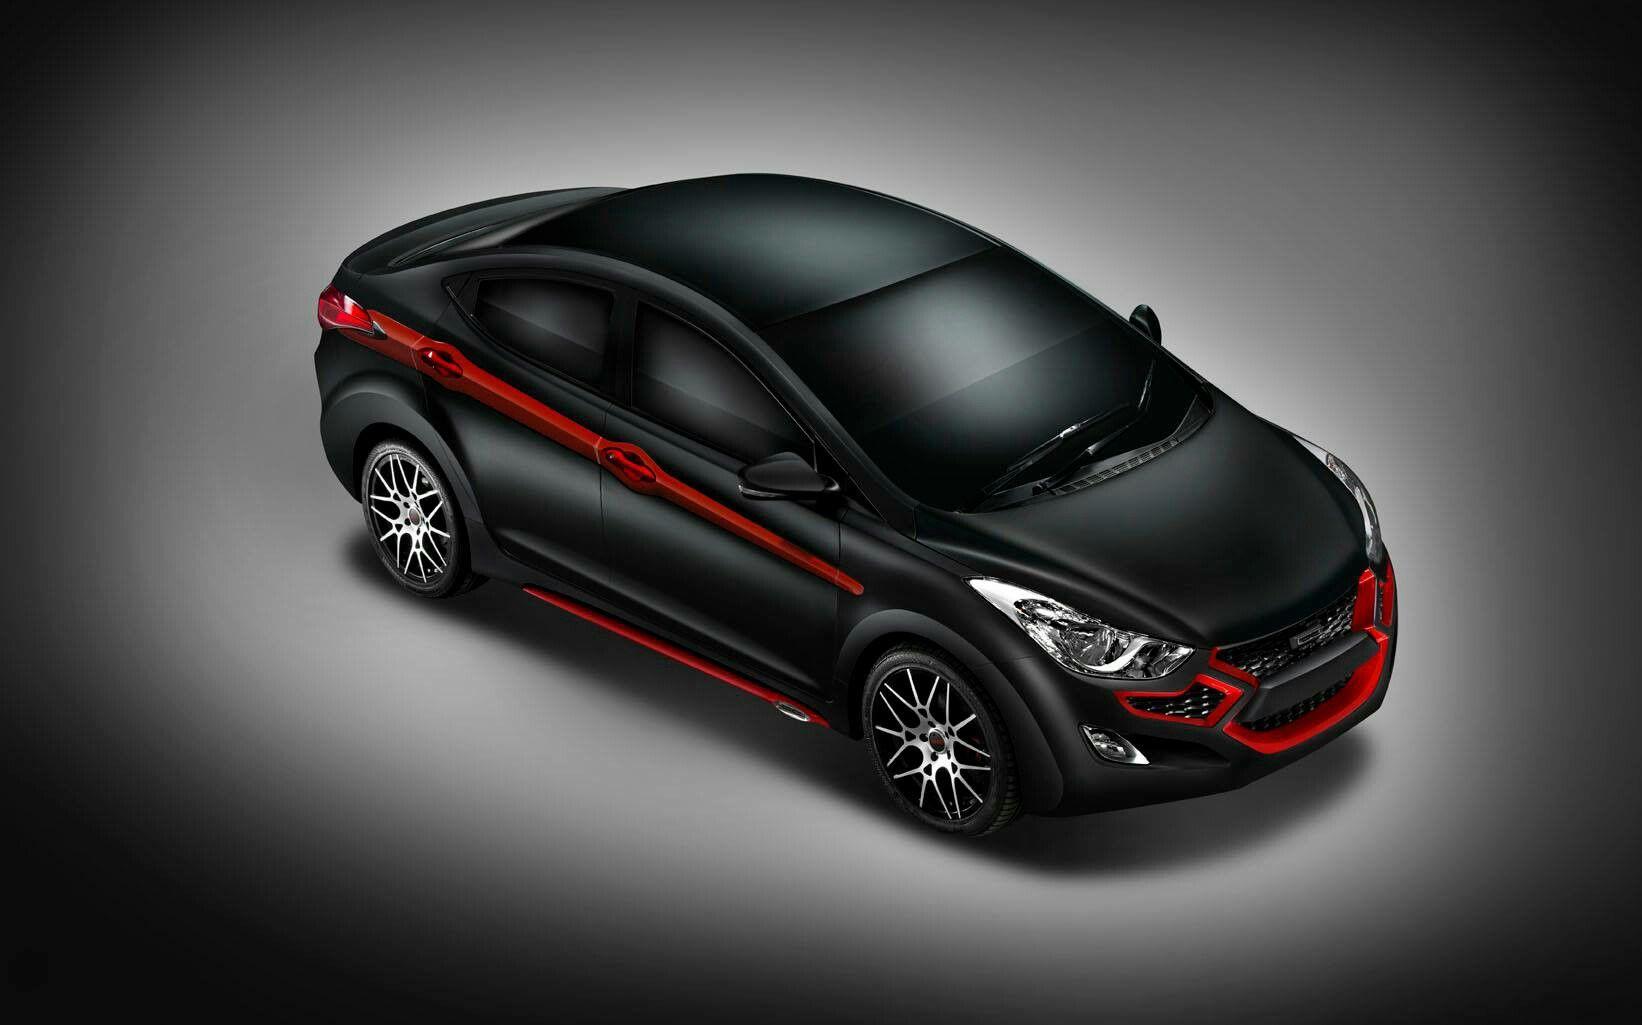 Pin By Djoa Dowski On Cars Hyundai Elantra Elantra Modified Cars